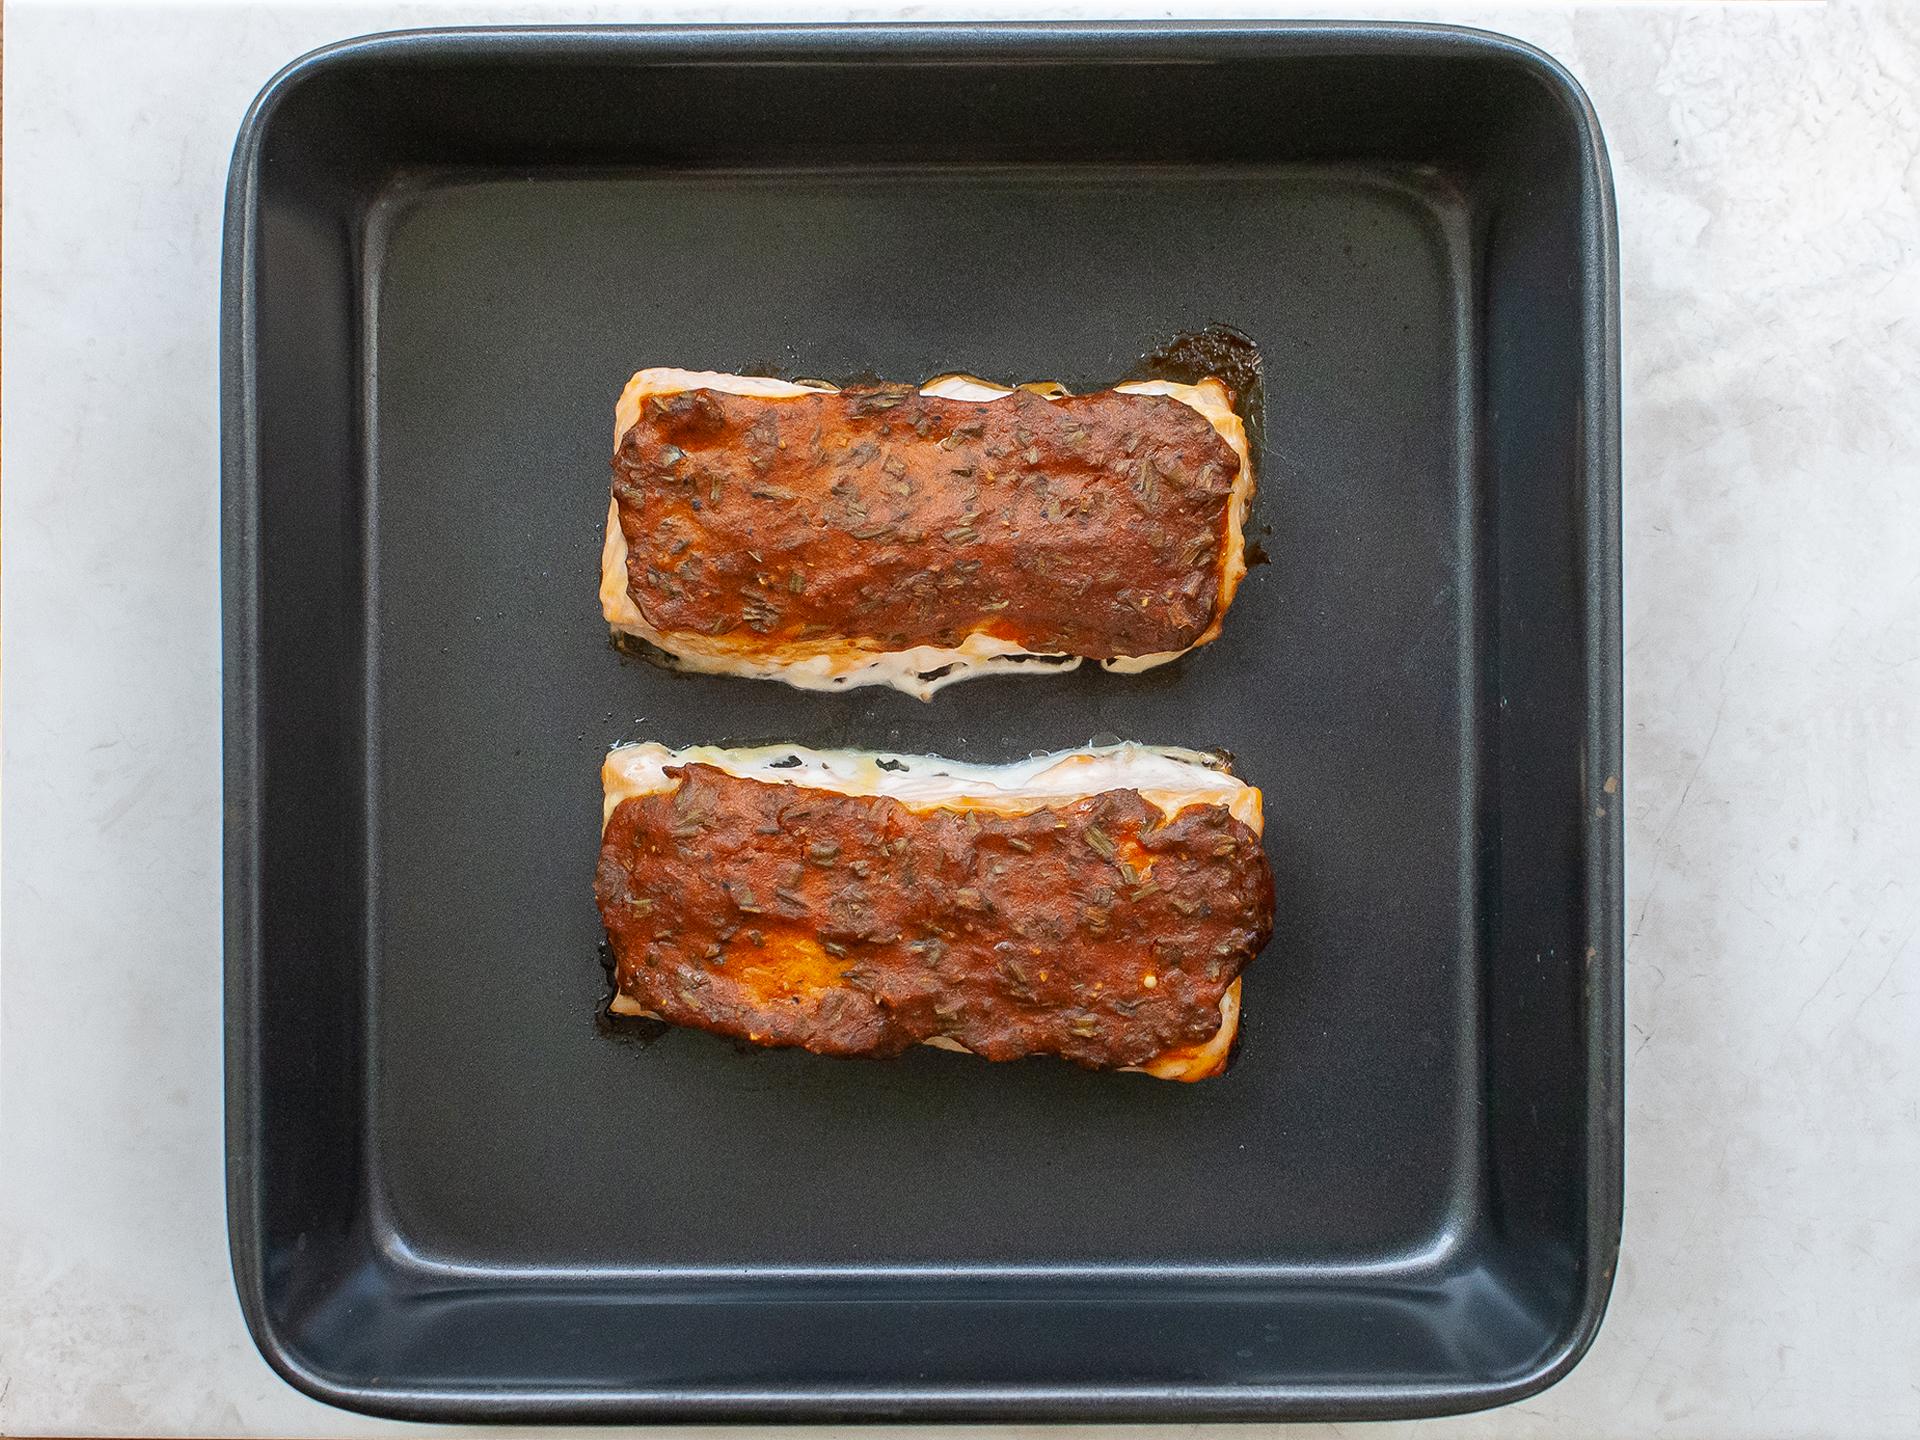 Baked honey mustard glazed salmon